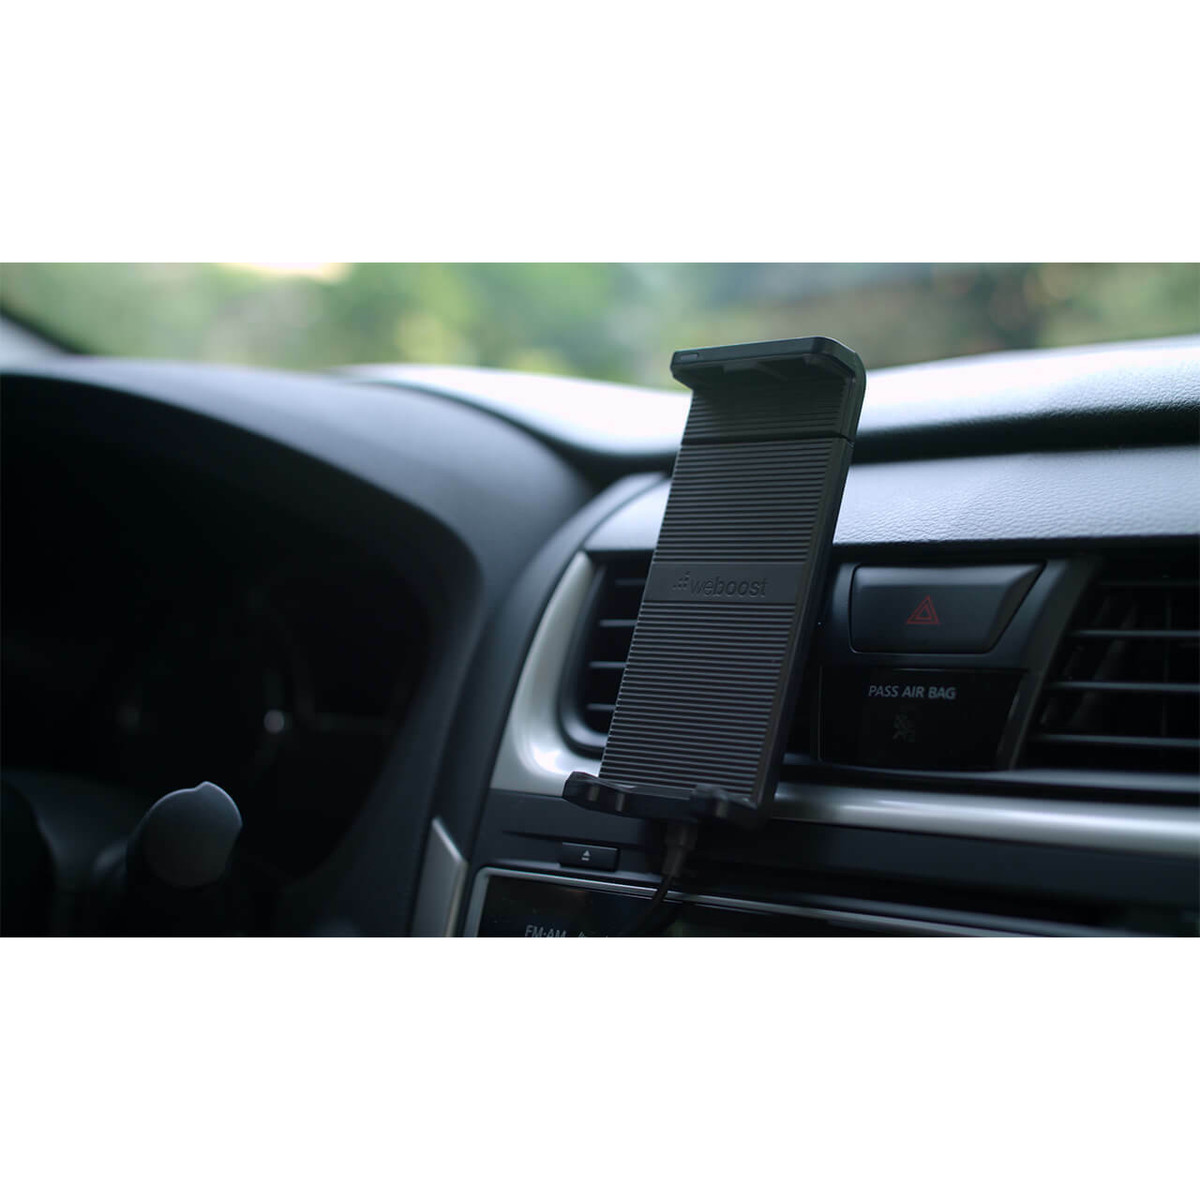 weBoost Drive Sleek Cell Phone Booster Kit, Refurbished - 470135FR